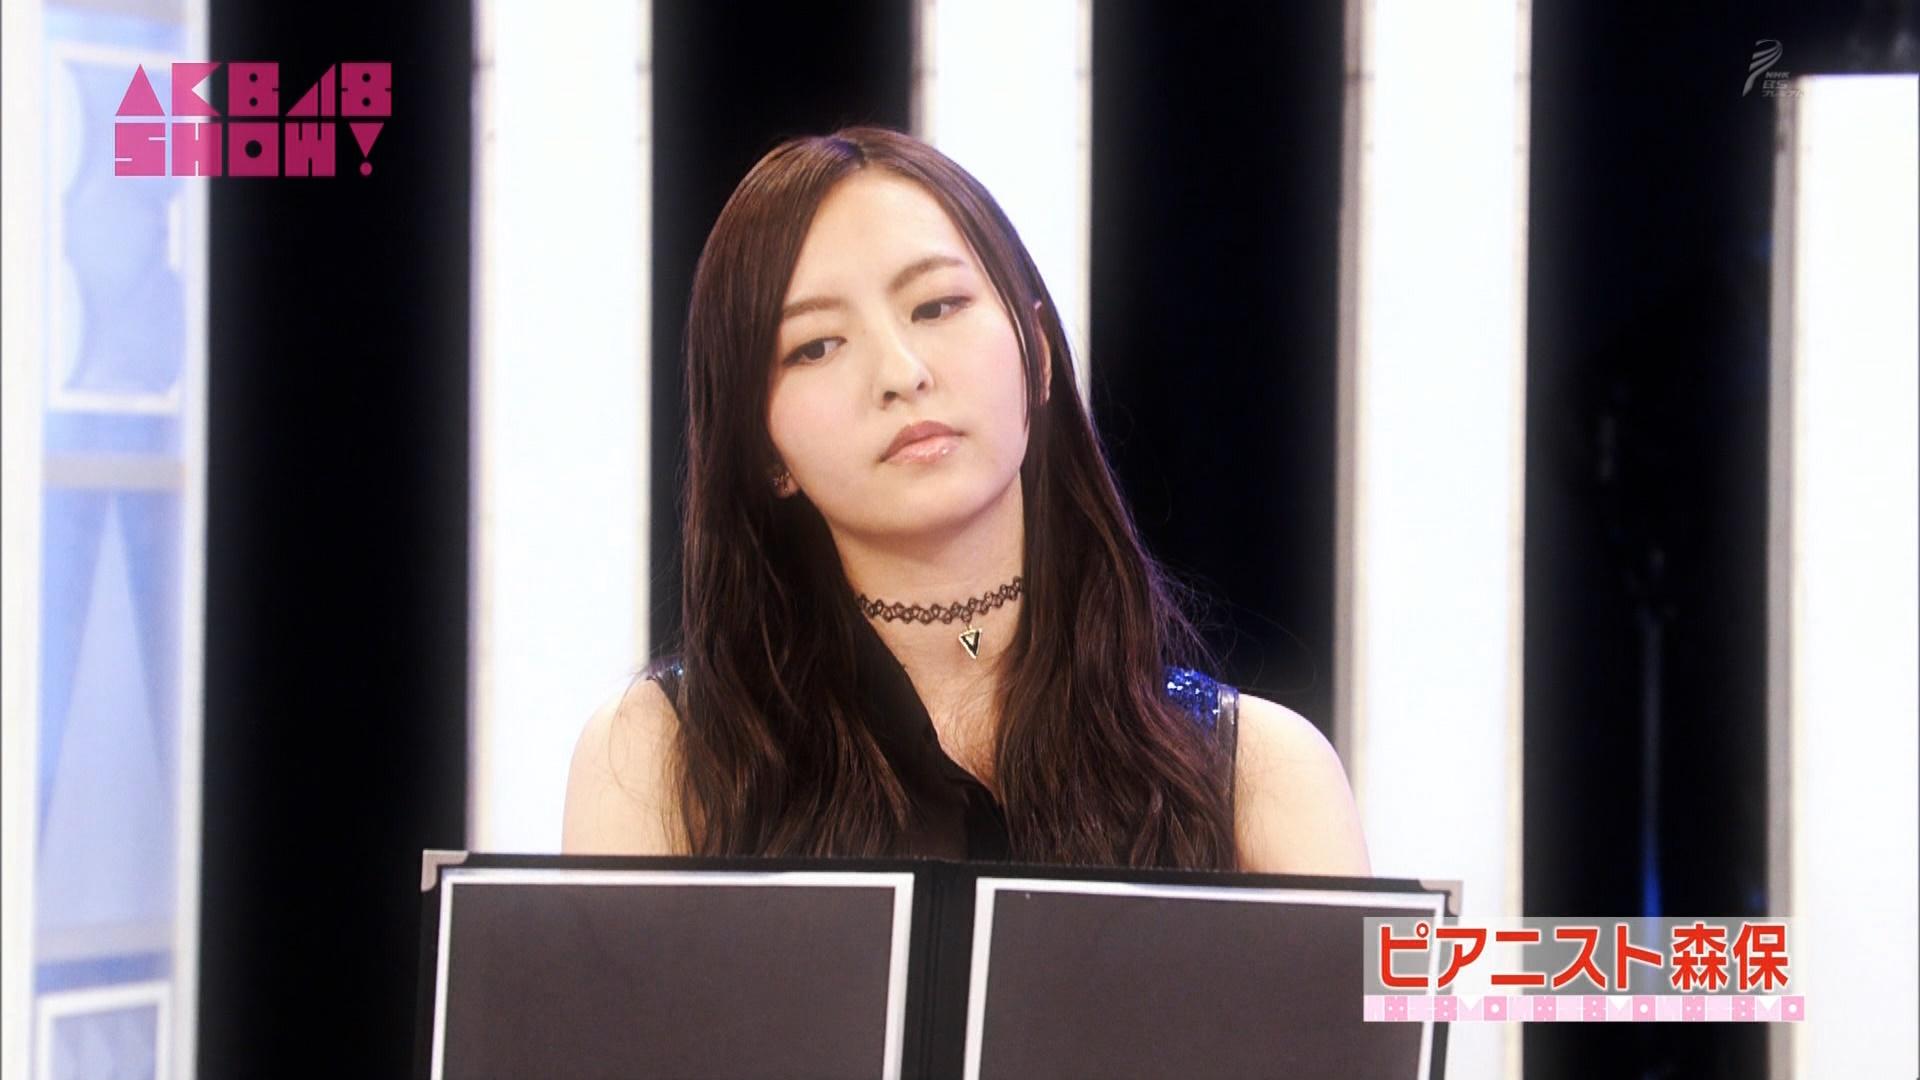 AKB48SHOW「#129」★1 [無断転載禁止]©2ch.net->画像>362枚